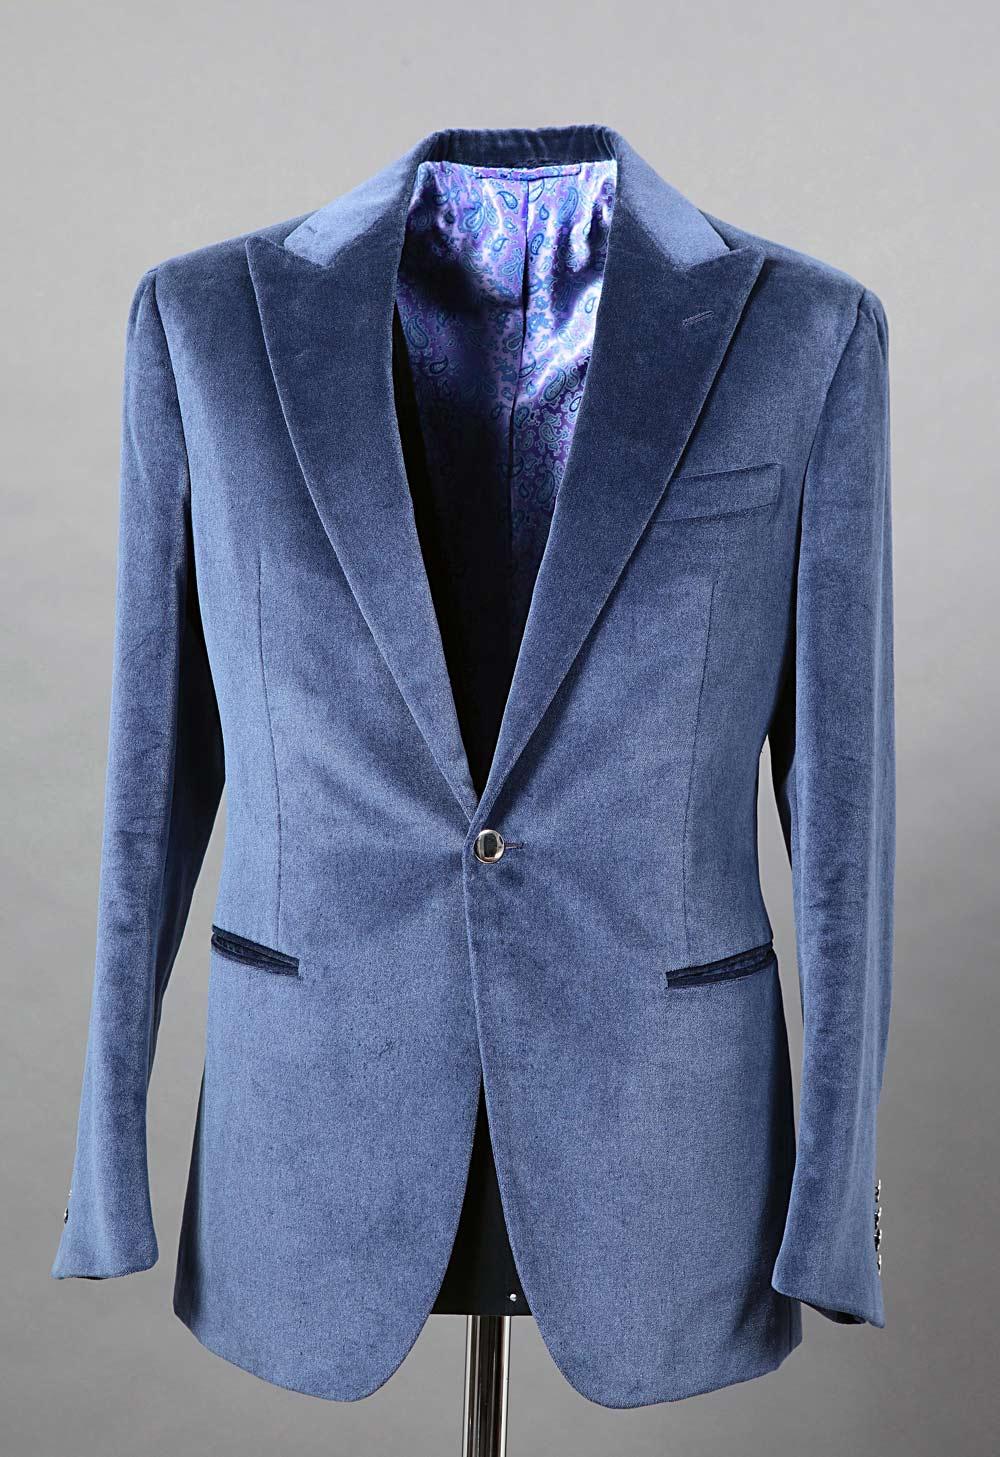 Santandrea smoking jacket